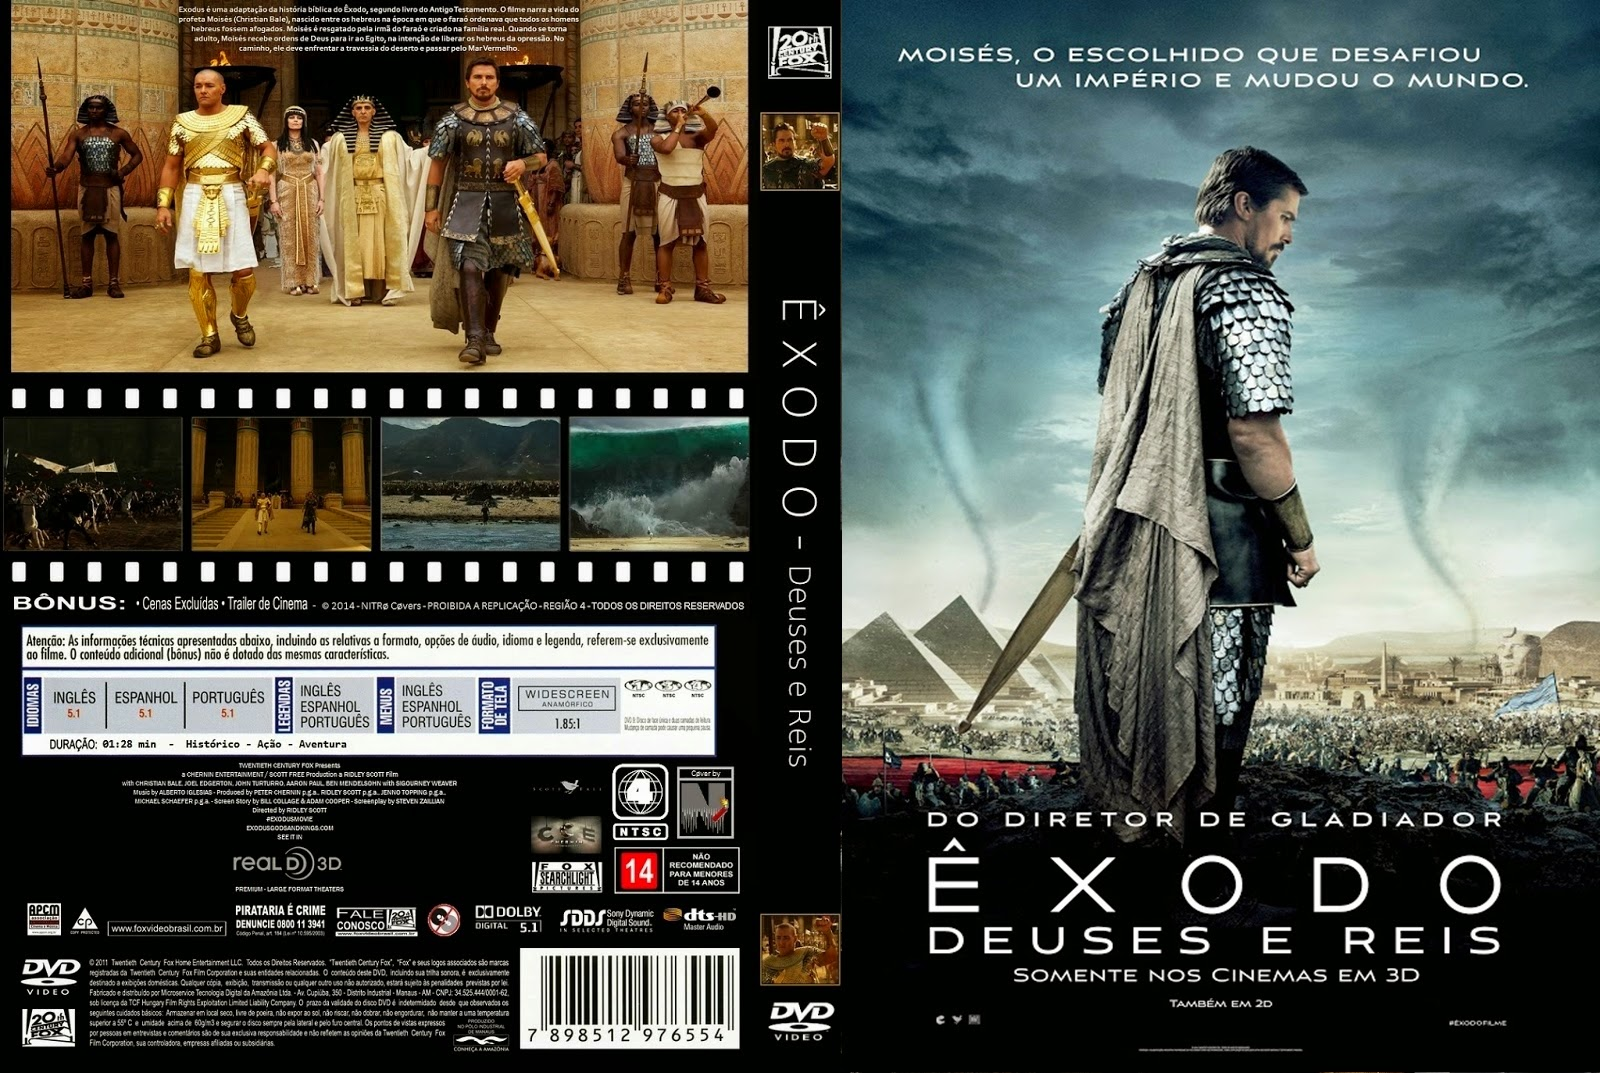 Download Êxodo Deuses e Reis DVDRip XviD Dual Áudio  C3 8Axodo 2B  2BDeuses 2BE 2BReis 2B02